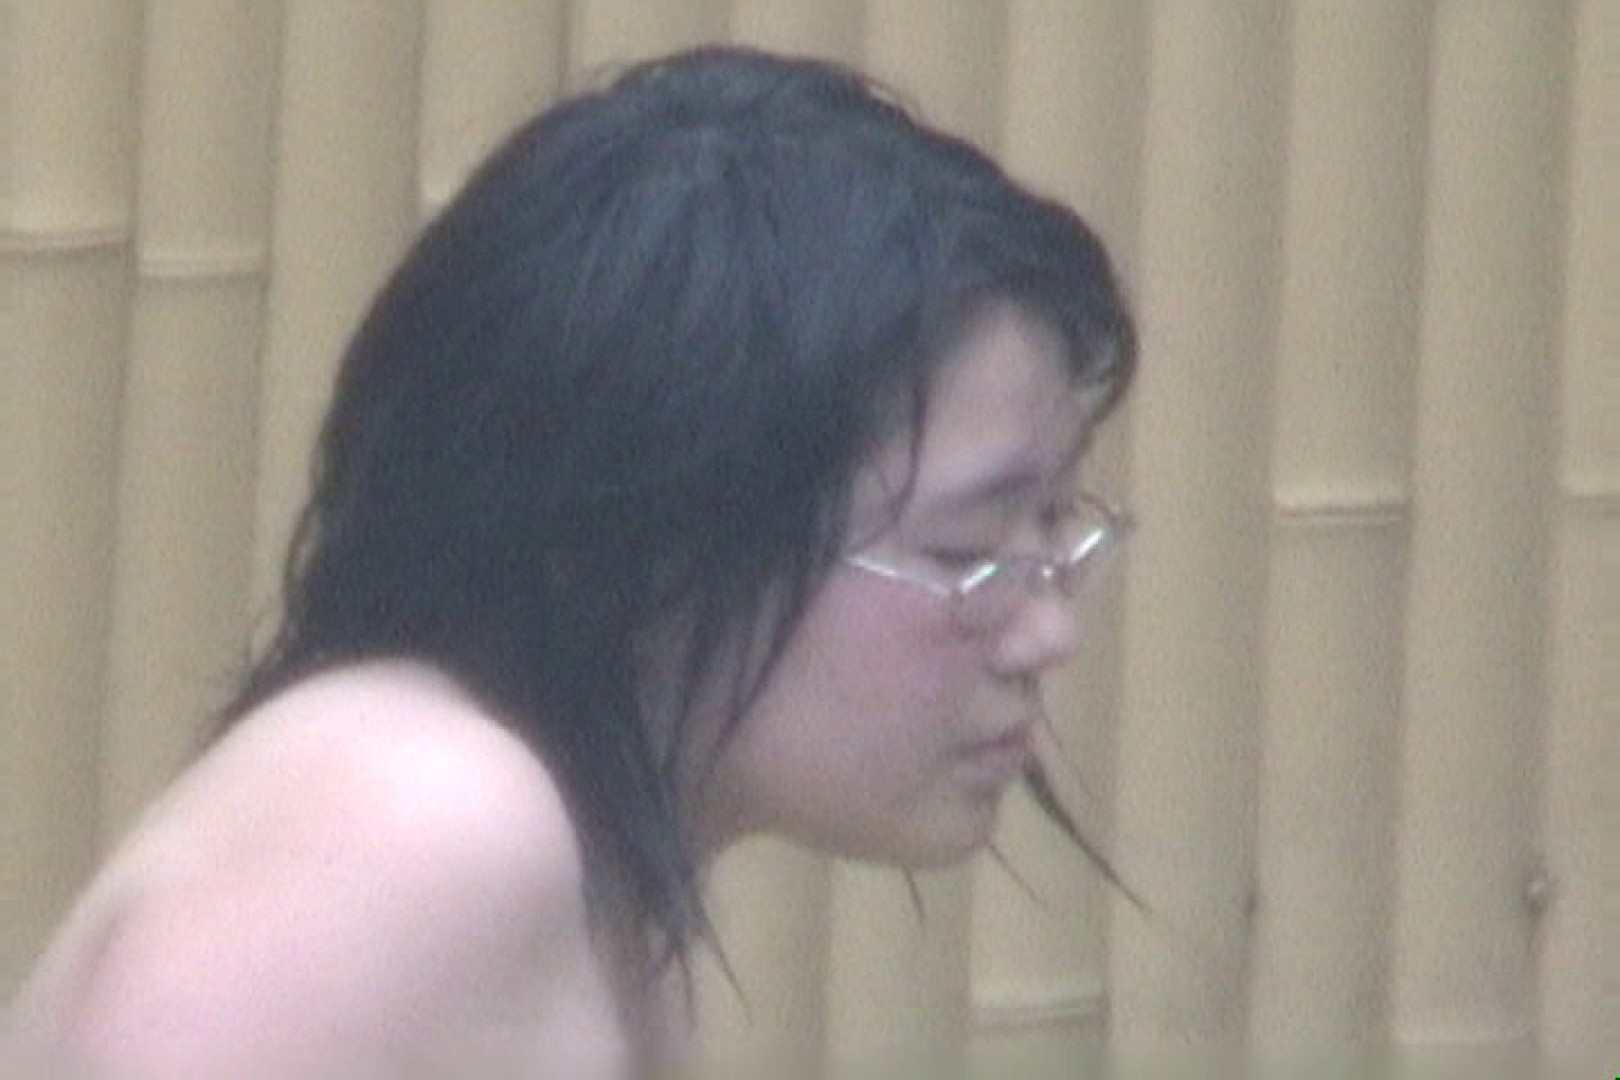 Aquaな露天風呂Vol.46【VIP限定】 OL女体 アダルト動画キャプチャ 98連発 95